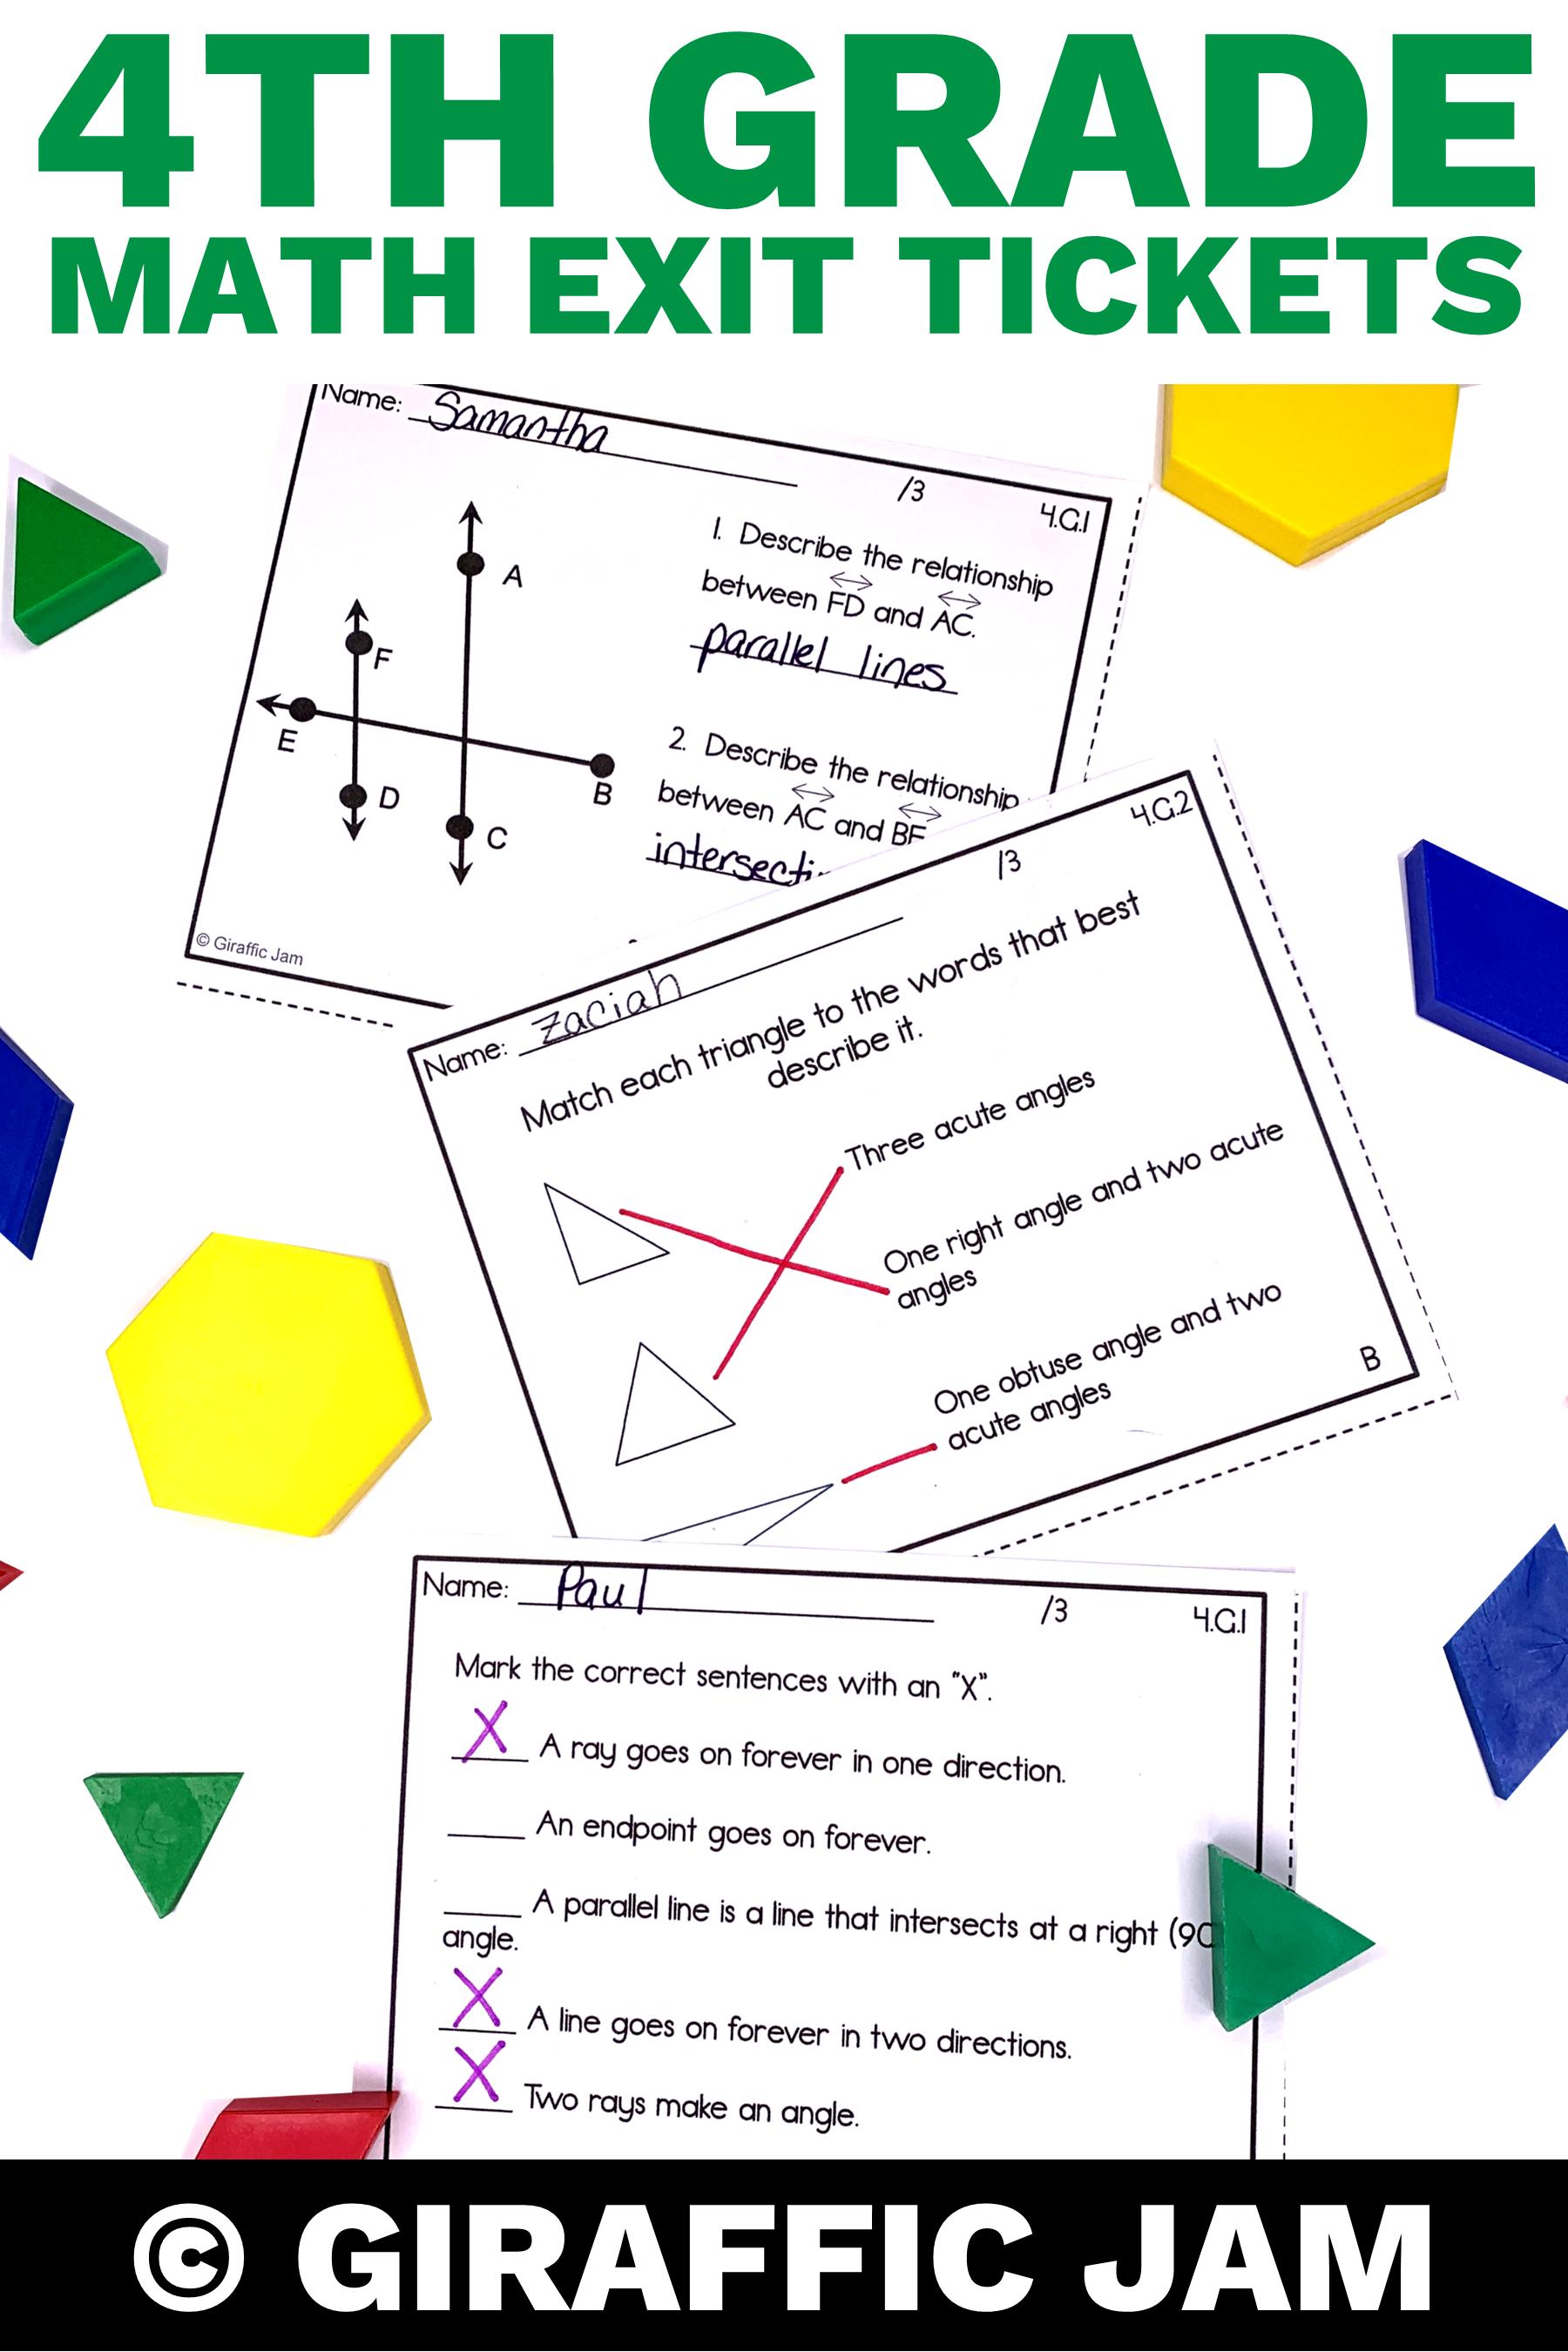 4th Grade Math Exit Tickets Geometry Exit Tickets Fourth Grade Math Common Core Math Standard Math Exit Tickets Common Core Math Standards 4th Grade Math [ 2700 x 1800 Pixel ]